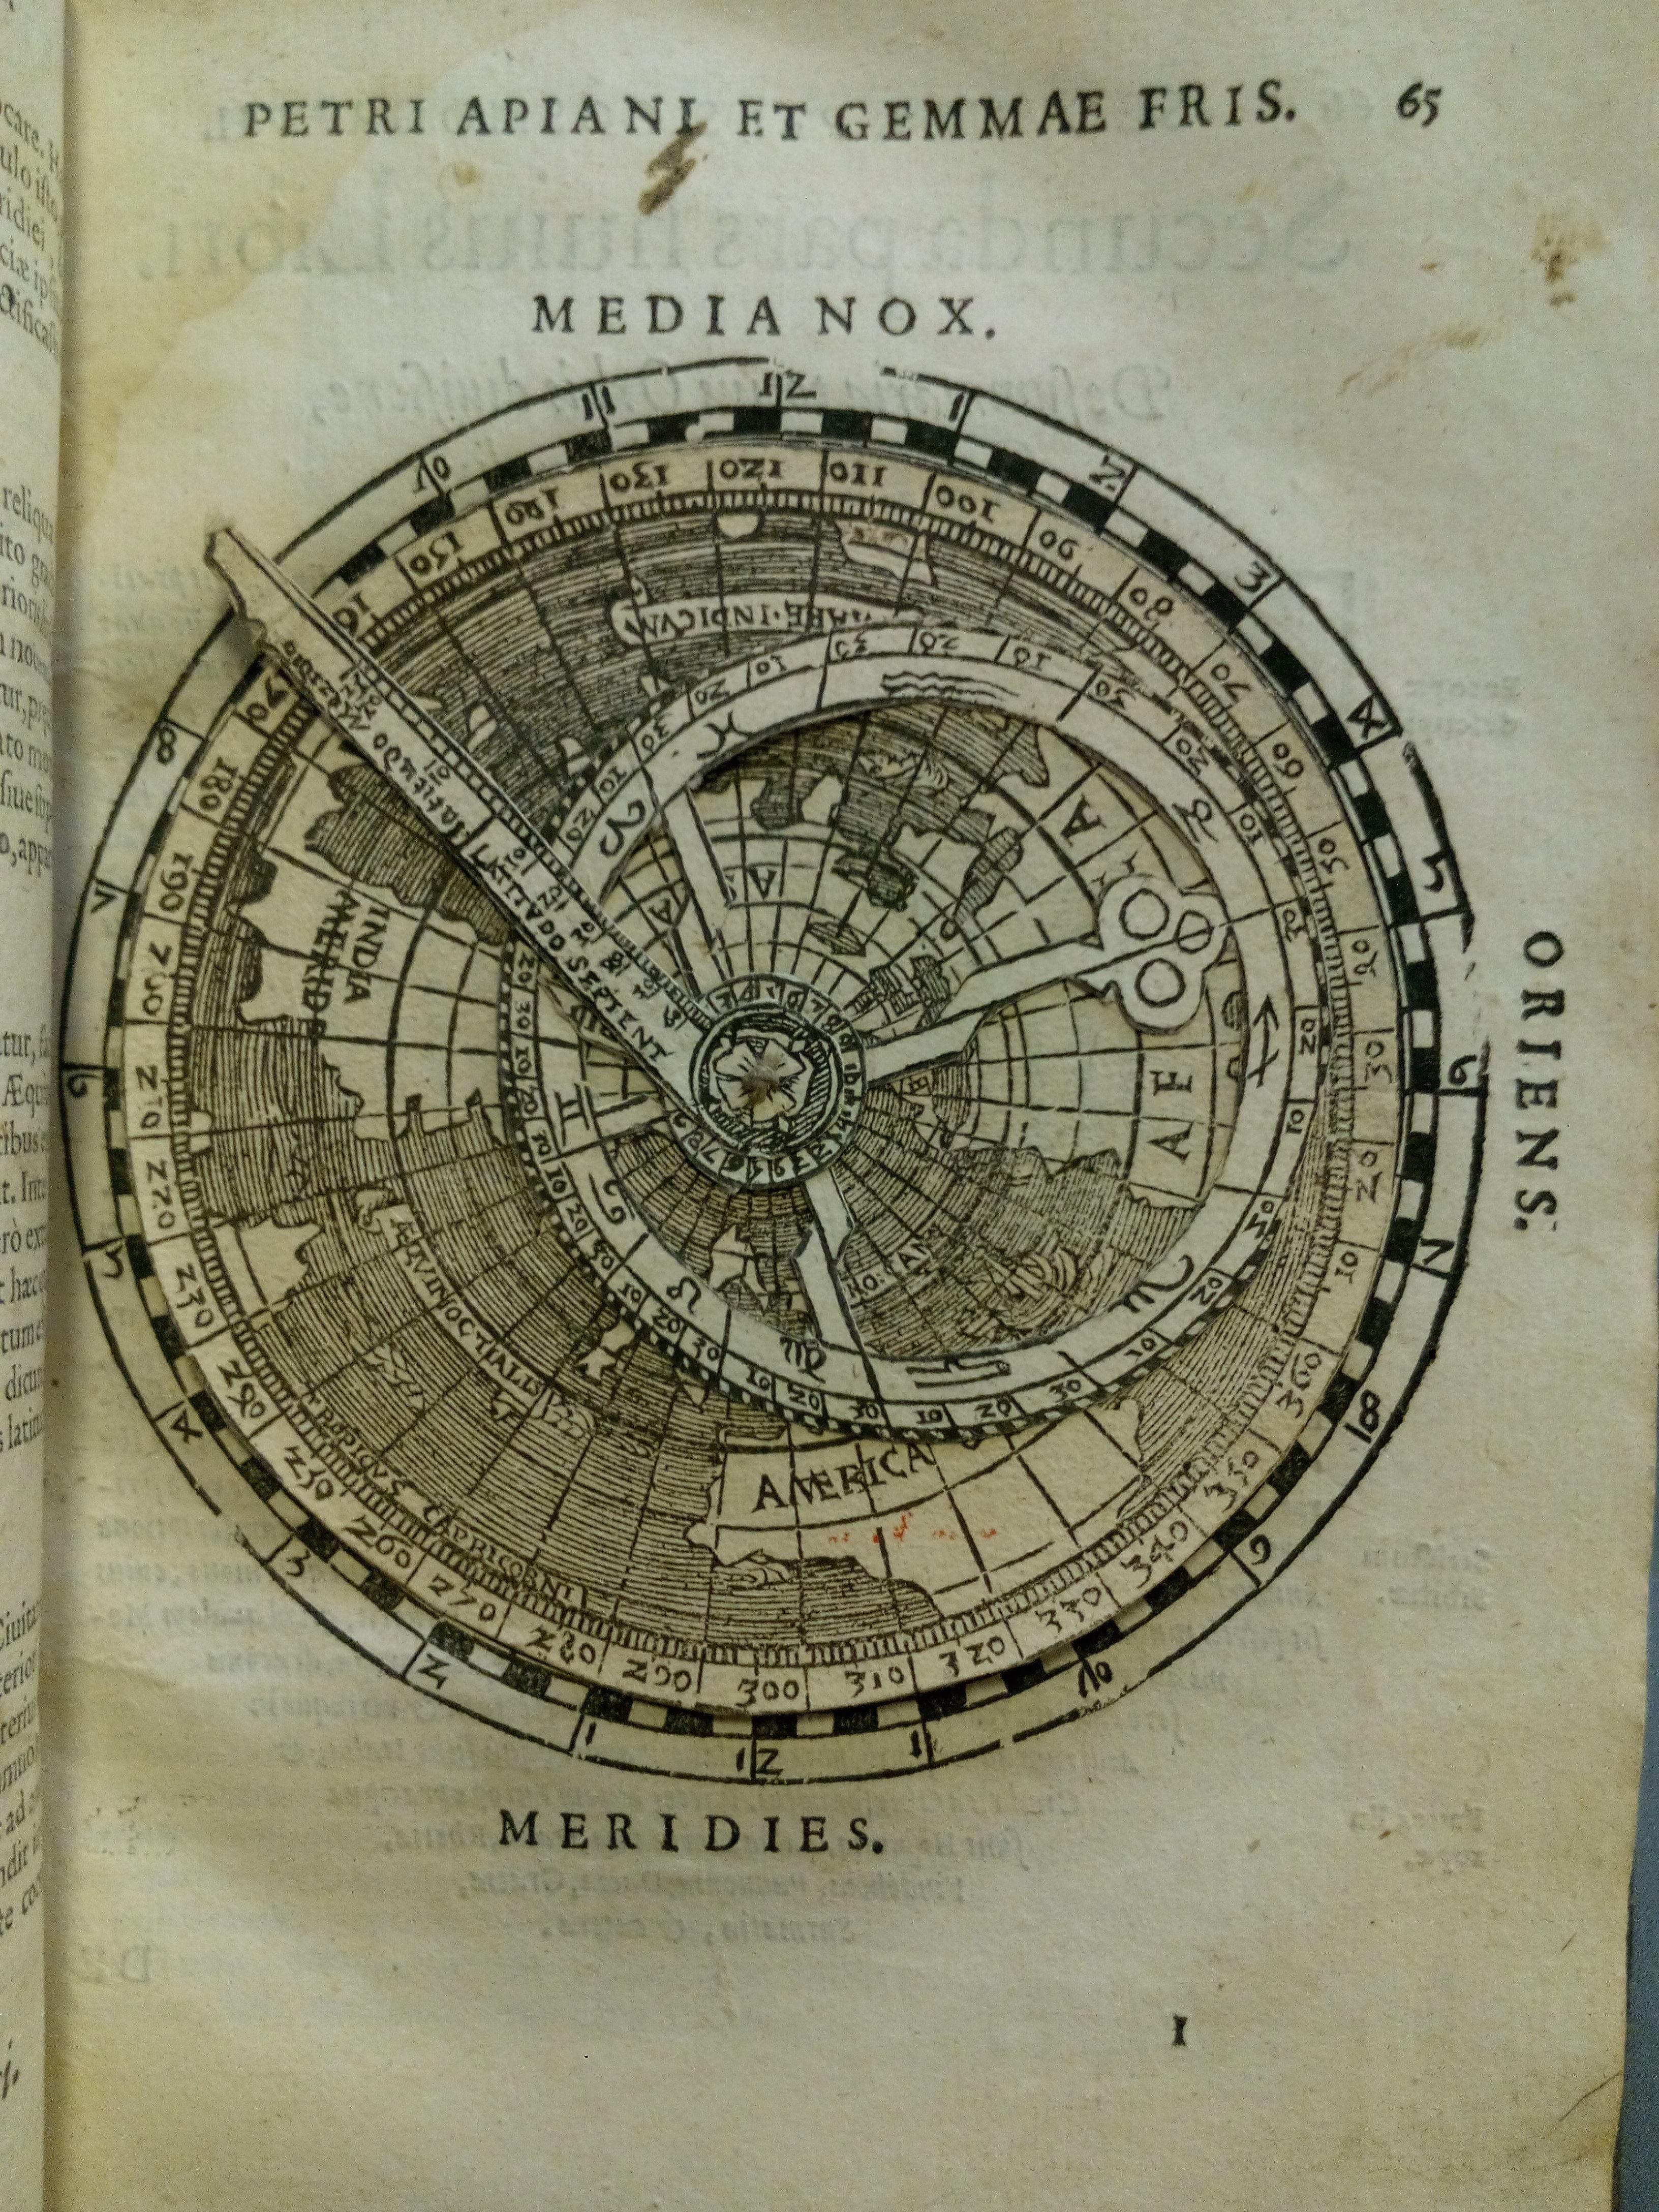 """Peter Apian, Cosmographia, sive descriptio universi orbis, Petri Apiani & Gemmae Frisij (Antwerp: Johannes Withagius, 1584), p. 65. University of St Andrews Library, TypNAn.B84BA"""